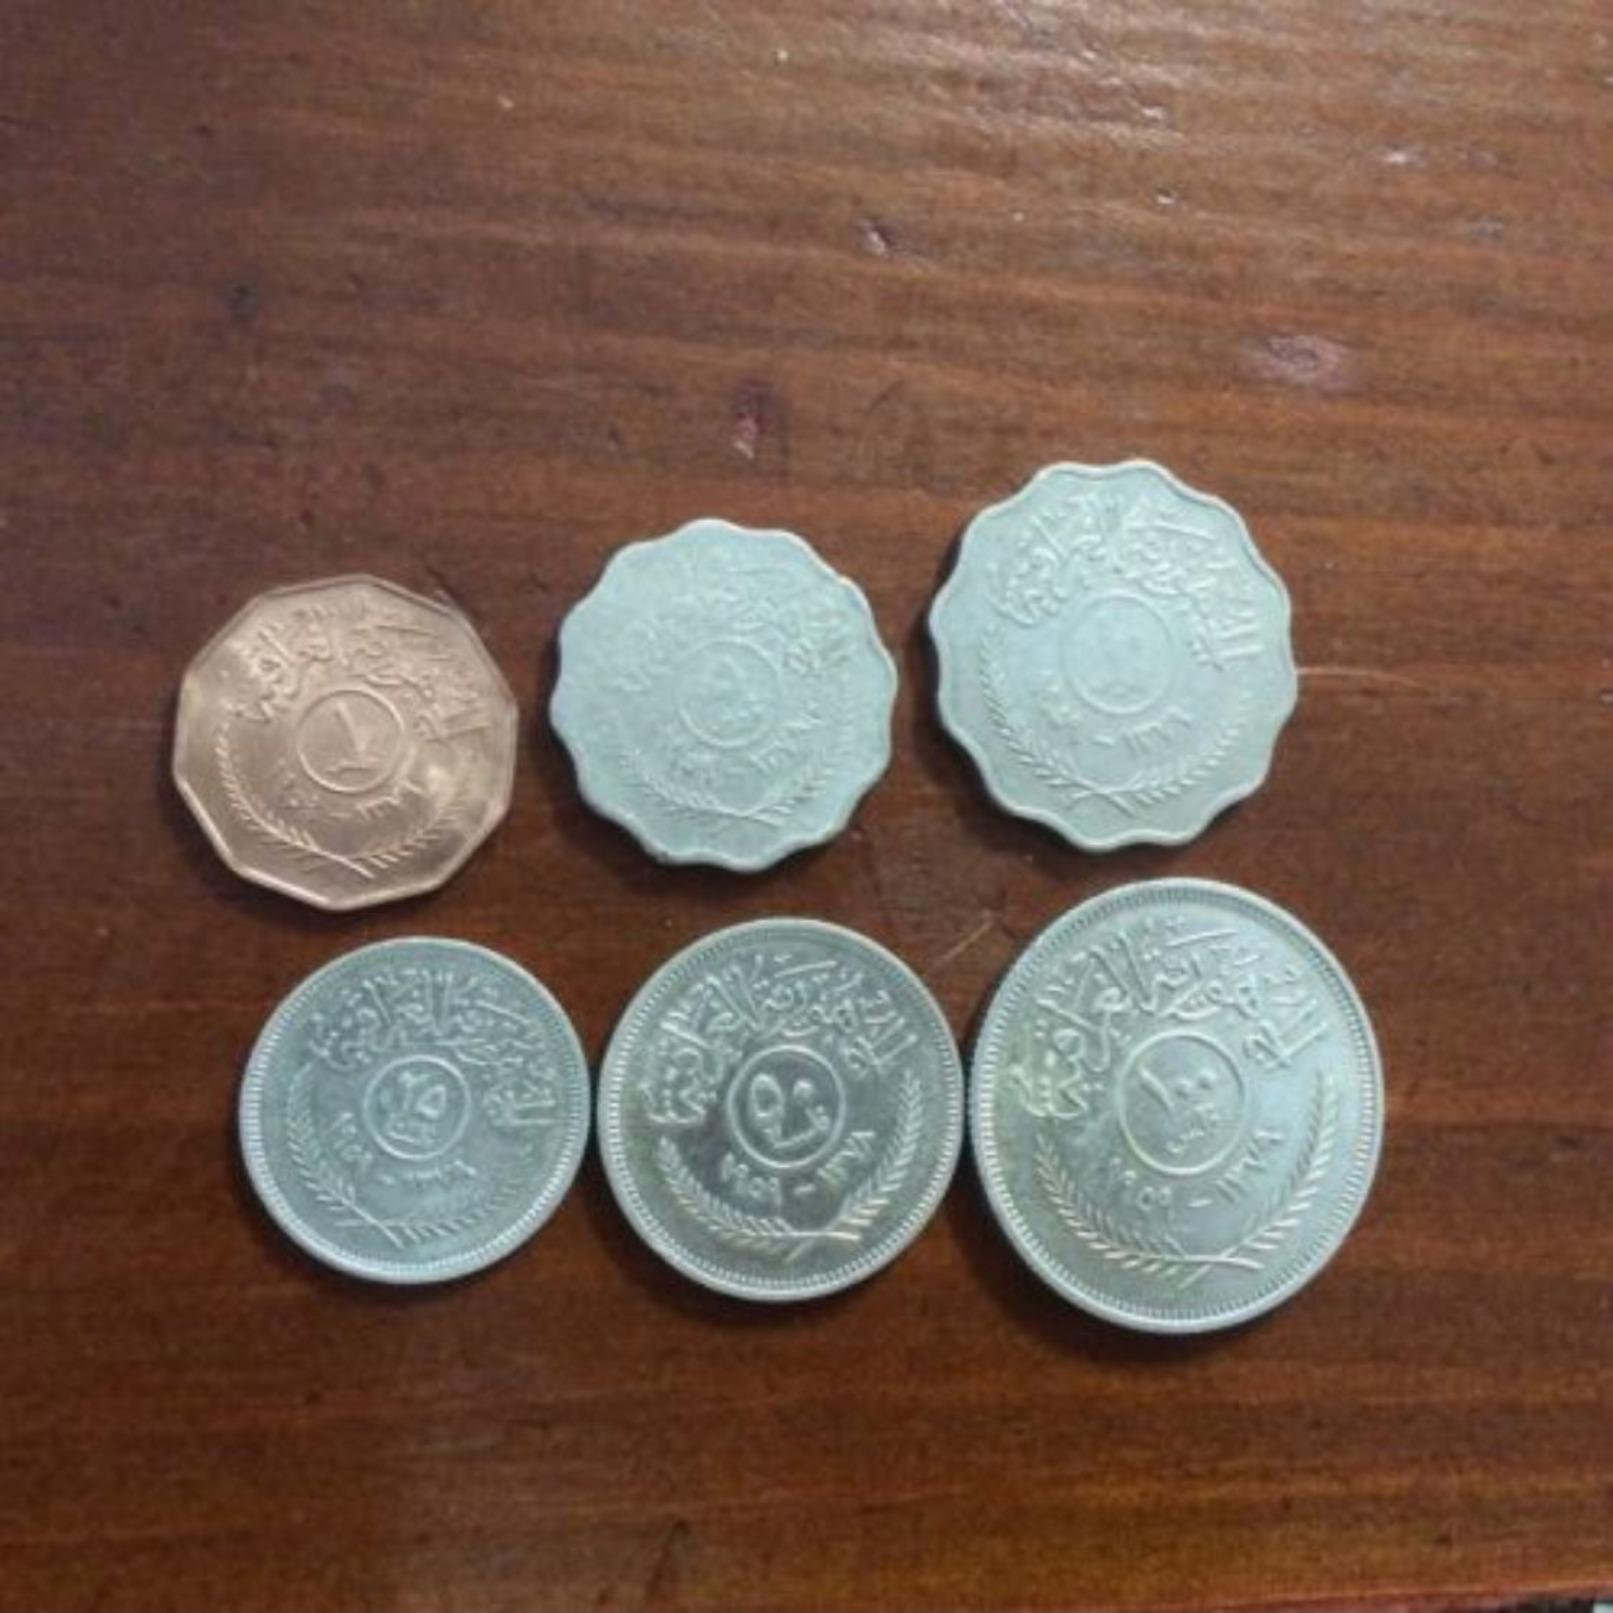 Iraq Set Coins 1959 Very Nice Condition  From 1 Fils - 100 Fils Abd Al Kareem Qasiem  ( 3 Silver Coins ) - Iraq